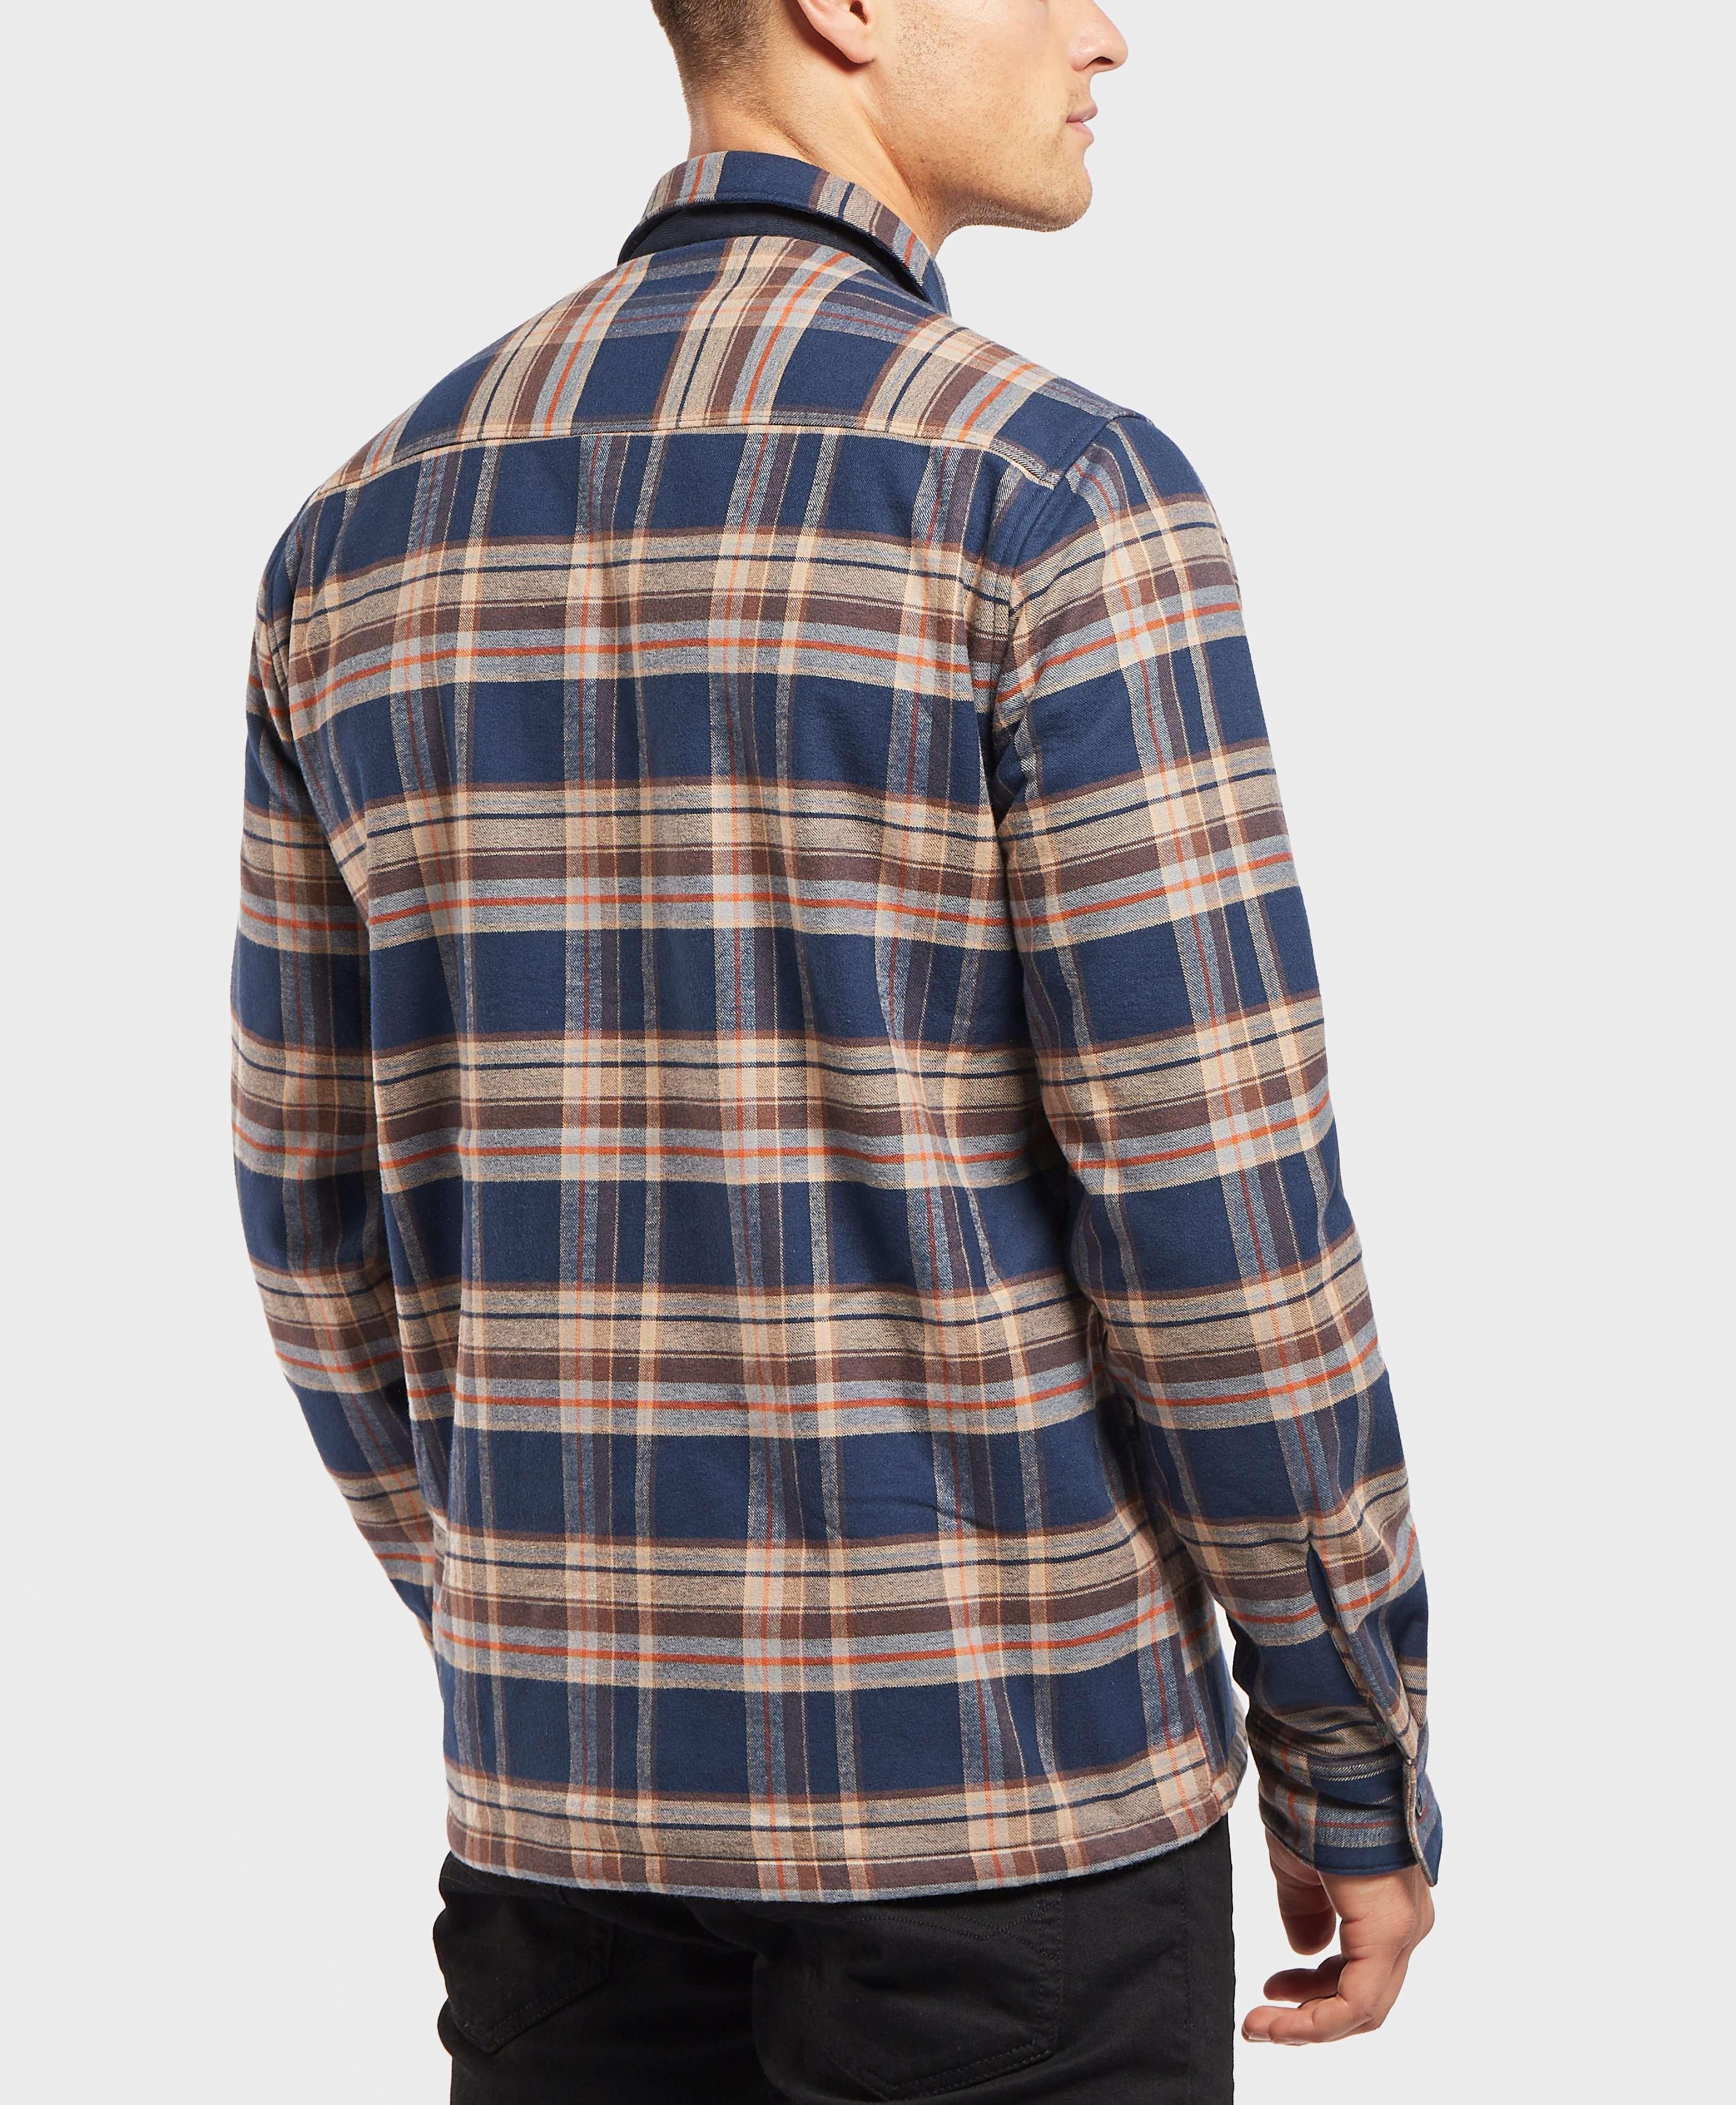 Barbour International x Steve McQueen Washer Overshirt